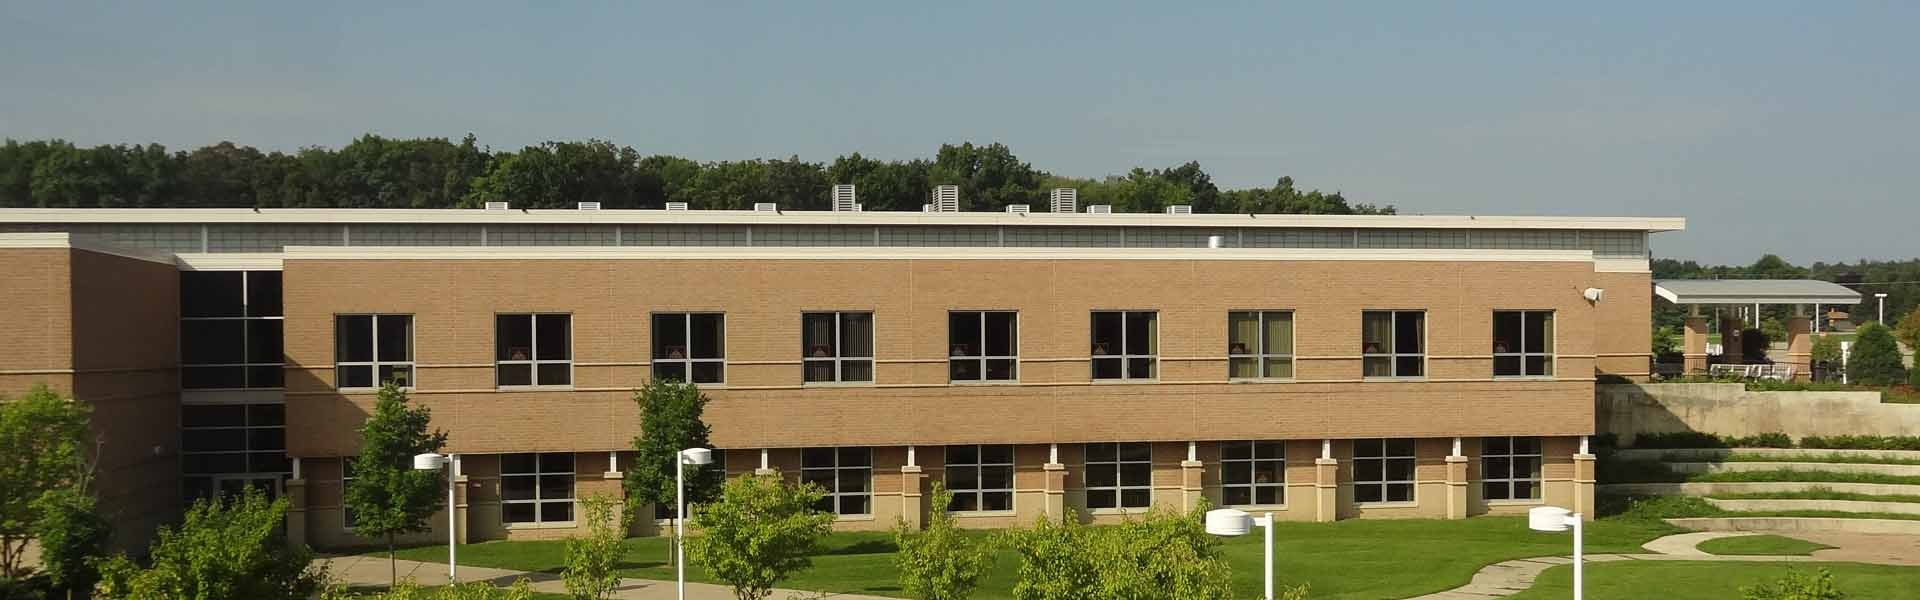 DexterCommunitySchools-HighSchool-Michigan-School-Banner-MAin-2019